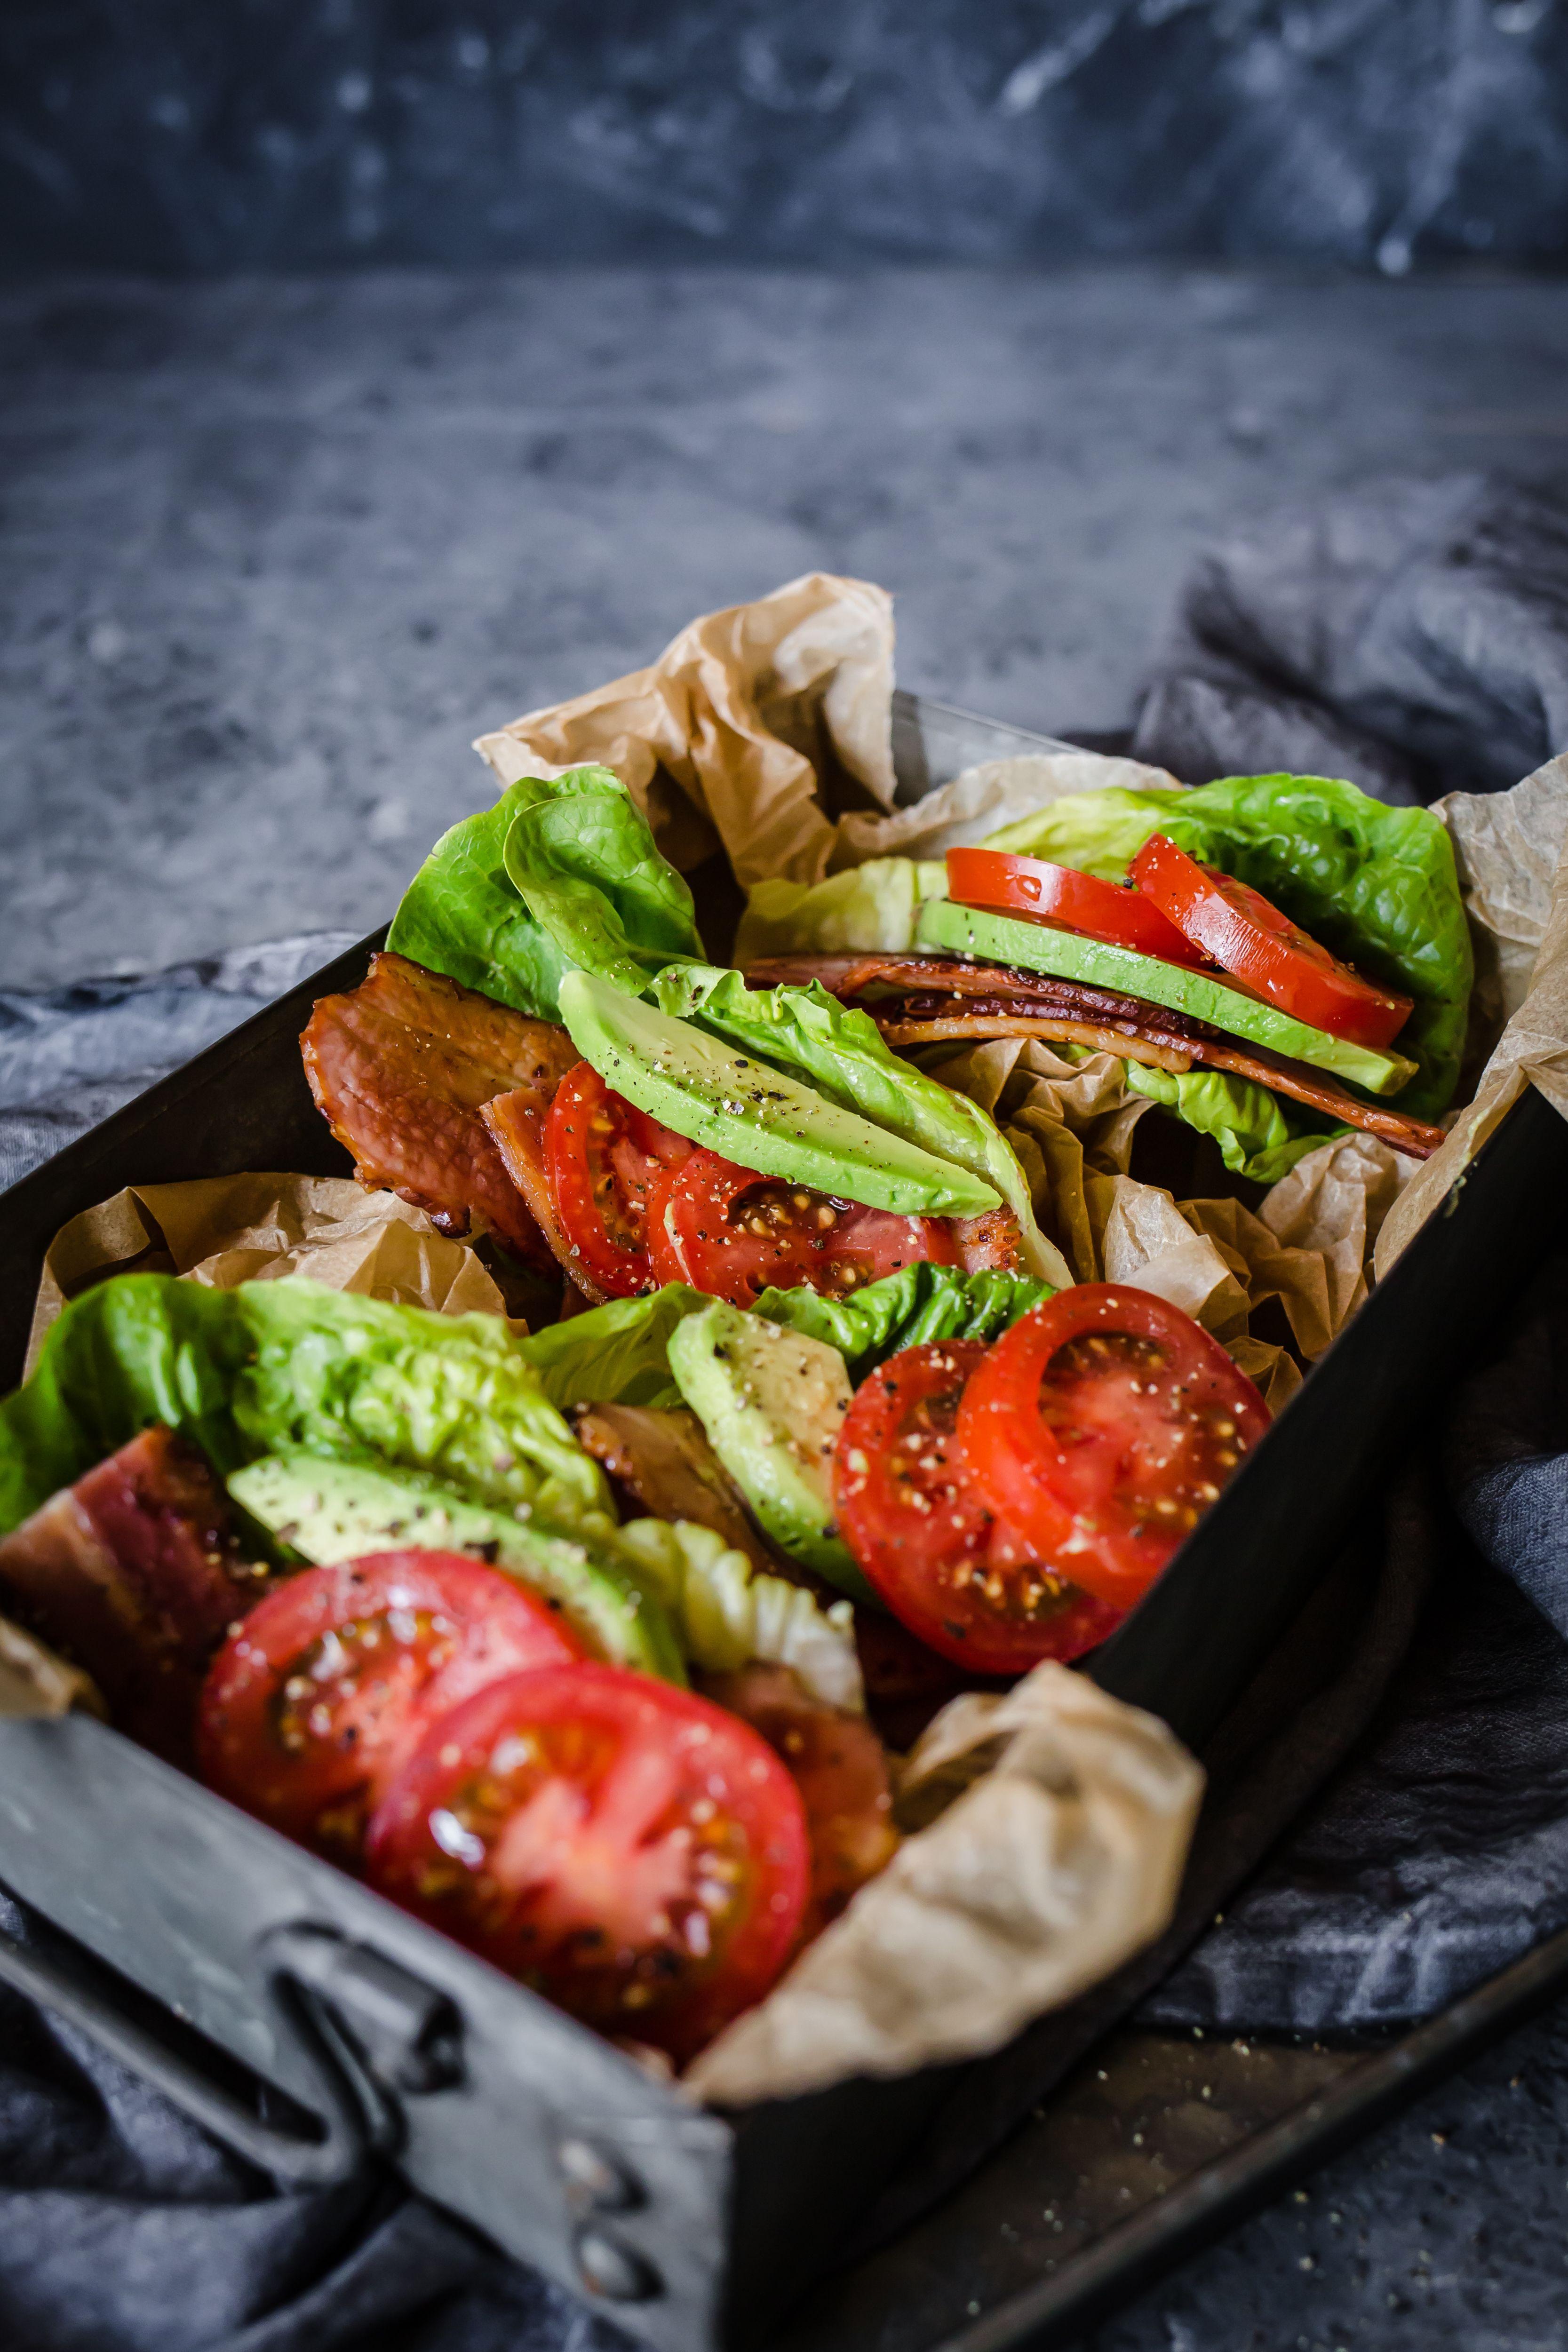 Keto Blta Lettuce Wraps Recipe Diet Doctor Recipe In 2020 Lettuce Wrap Recipes Diet Doctor Recipes Recipes